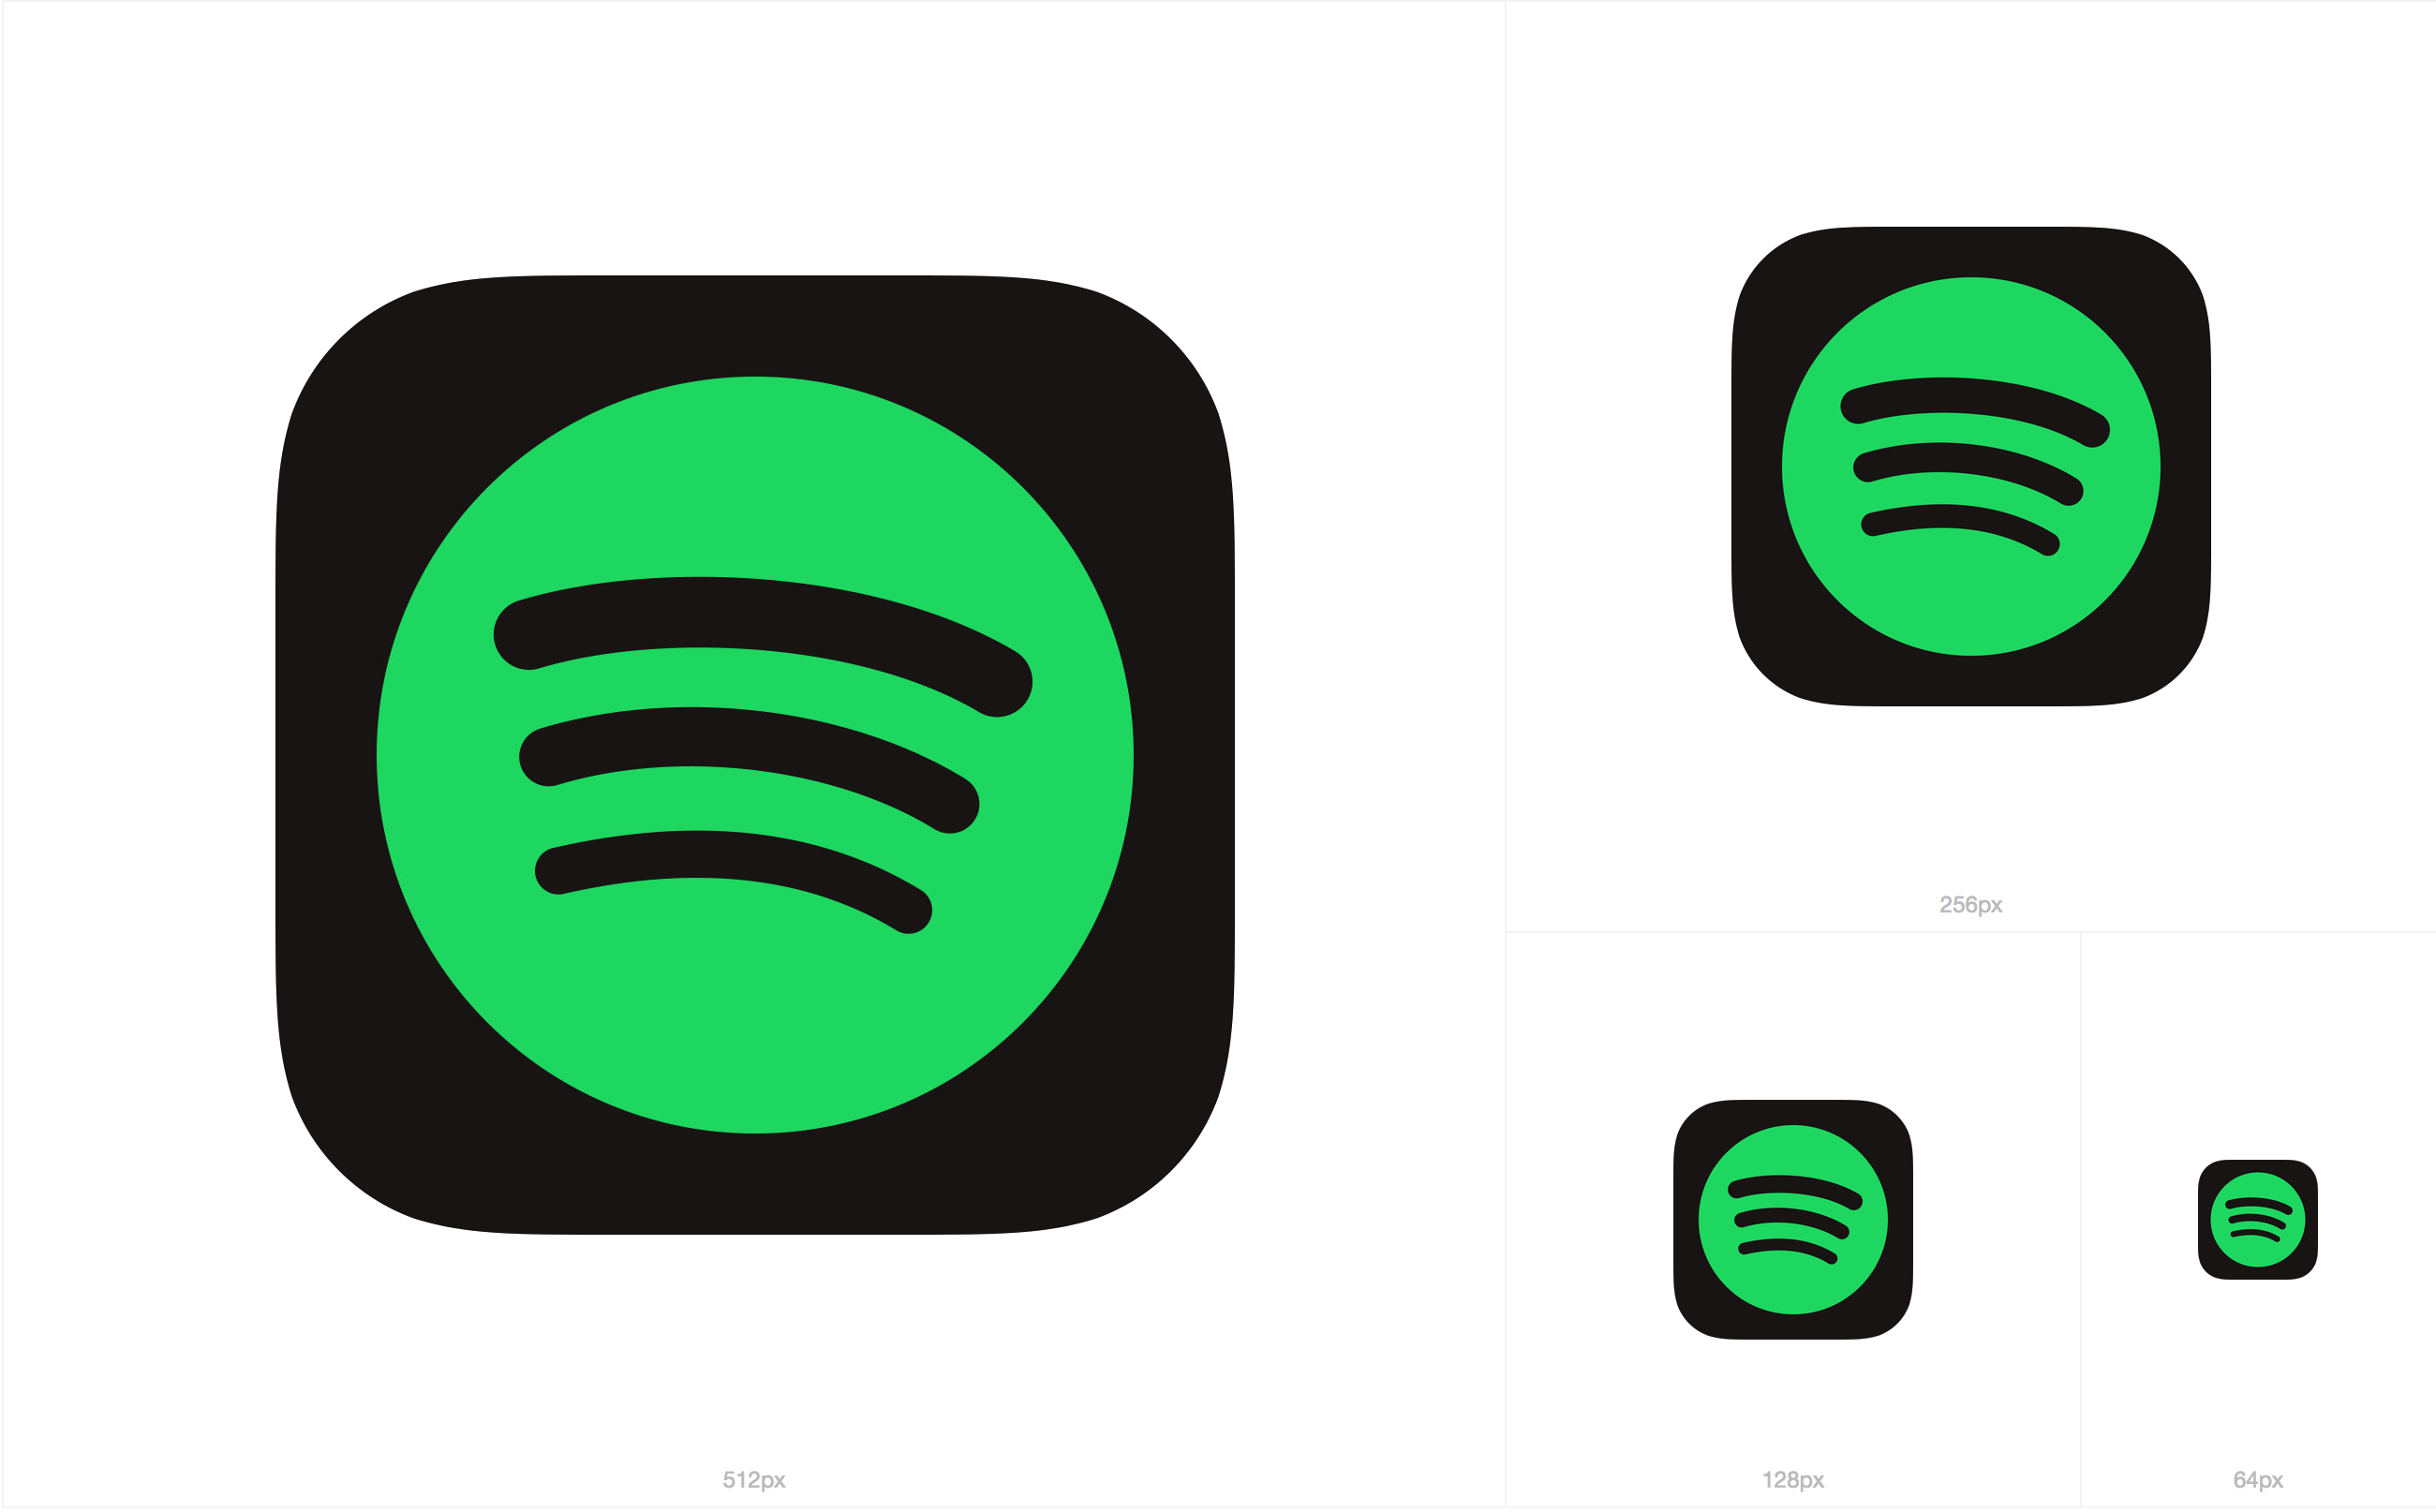 iOS 7 Icon Template PSD, SVG, Sketch Ios 7 icons